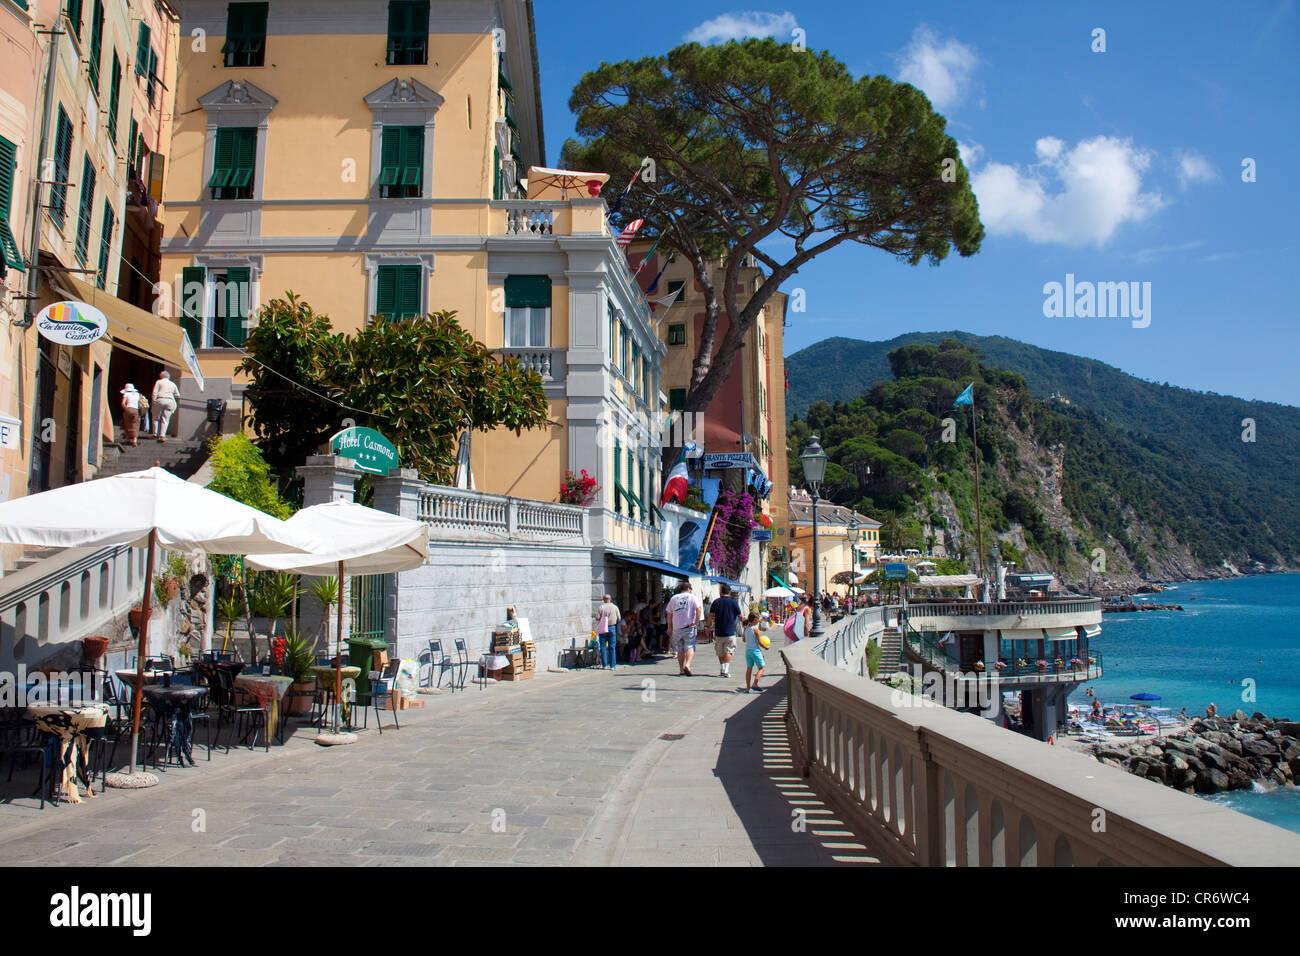 Best Italian Restaurant In Portofino